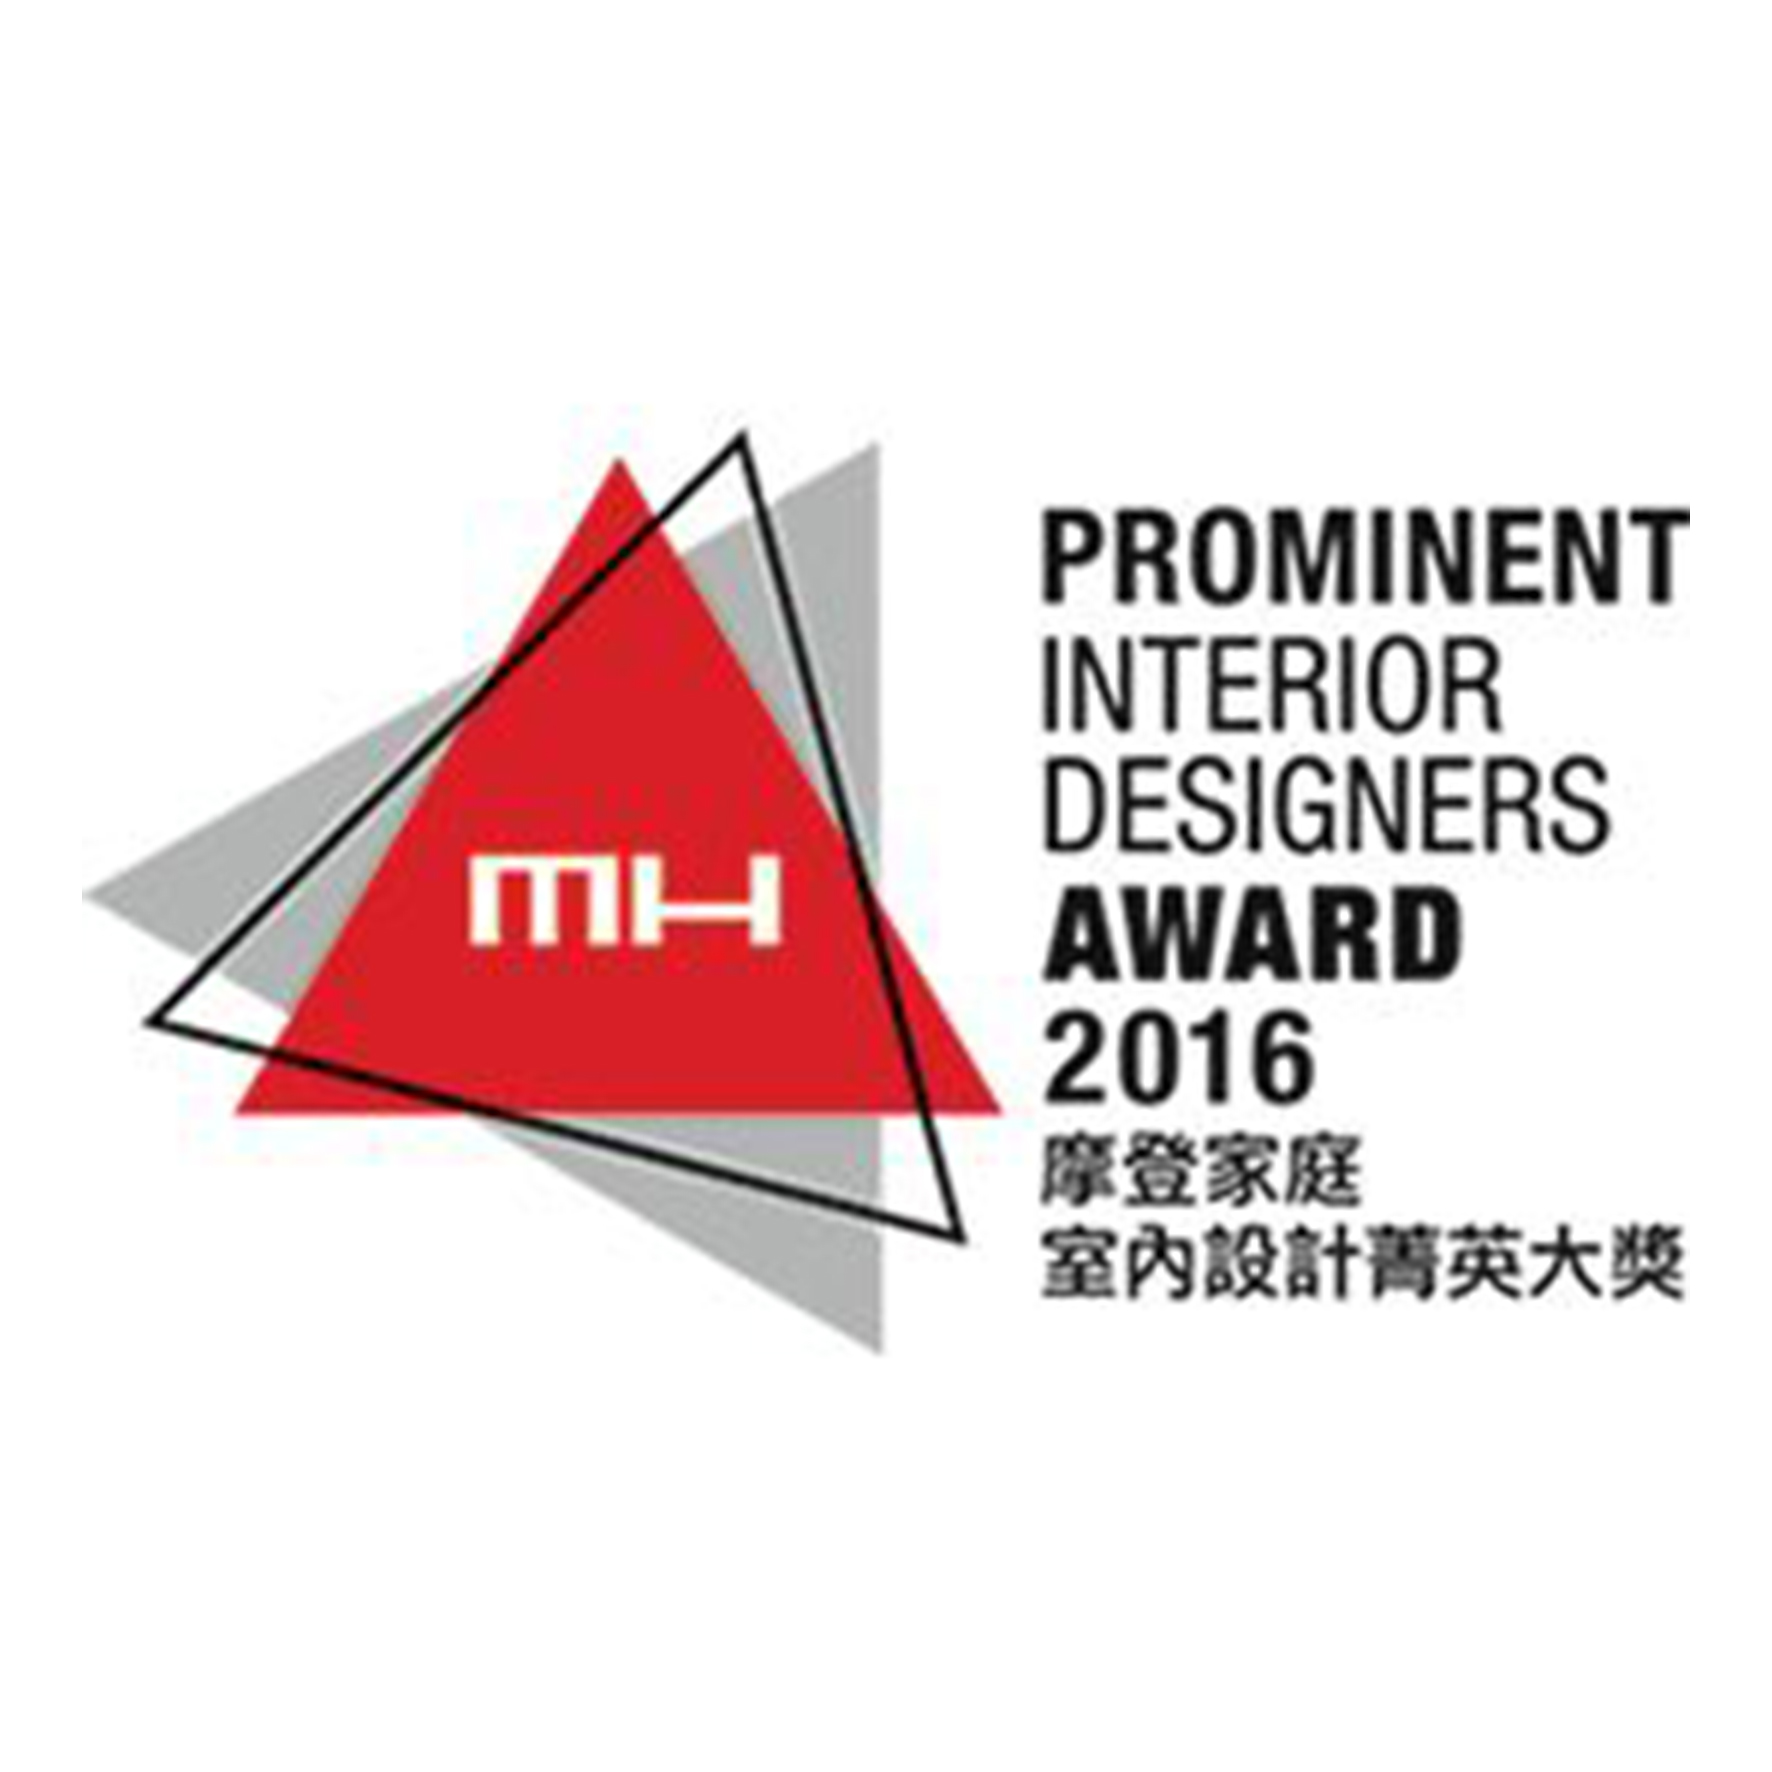 MH Prominent Interior Designer Award, Modern Home Designer Award 2016 (摩登家庭2016室内设计菁英)